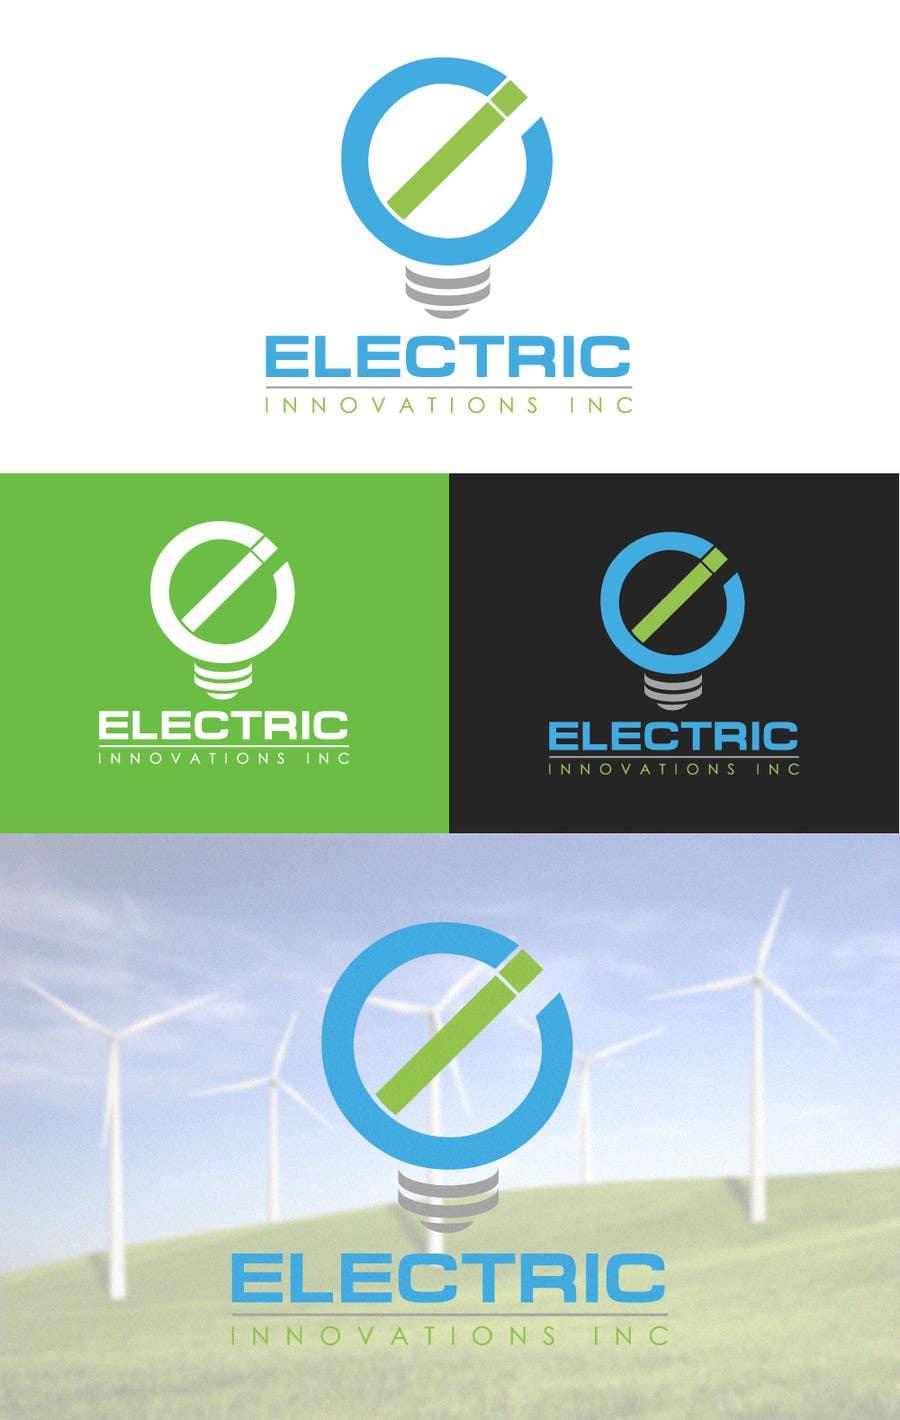 Kilpailutyö #219 kilpailussa Design a Logo for Electric Innovations Inc.